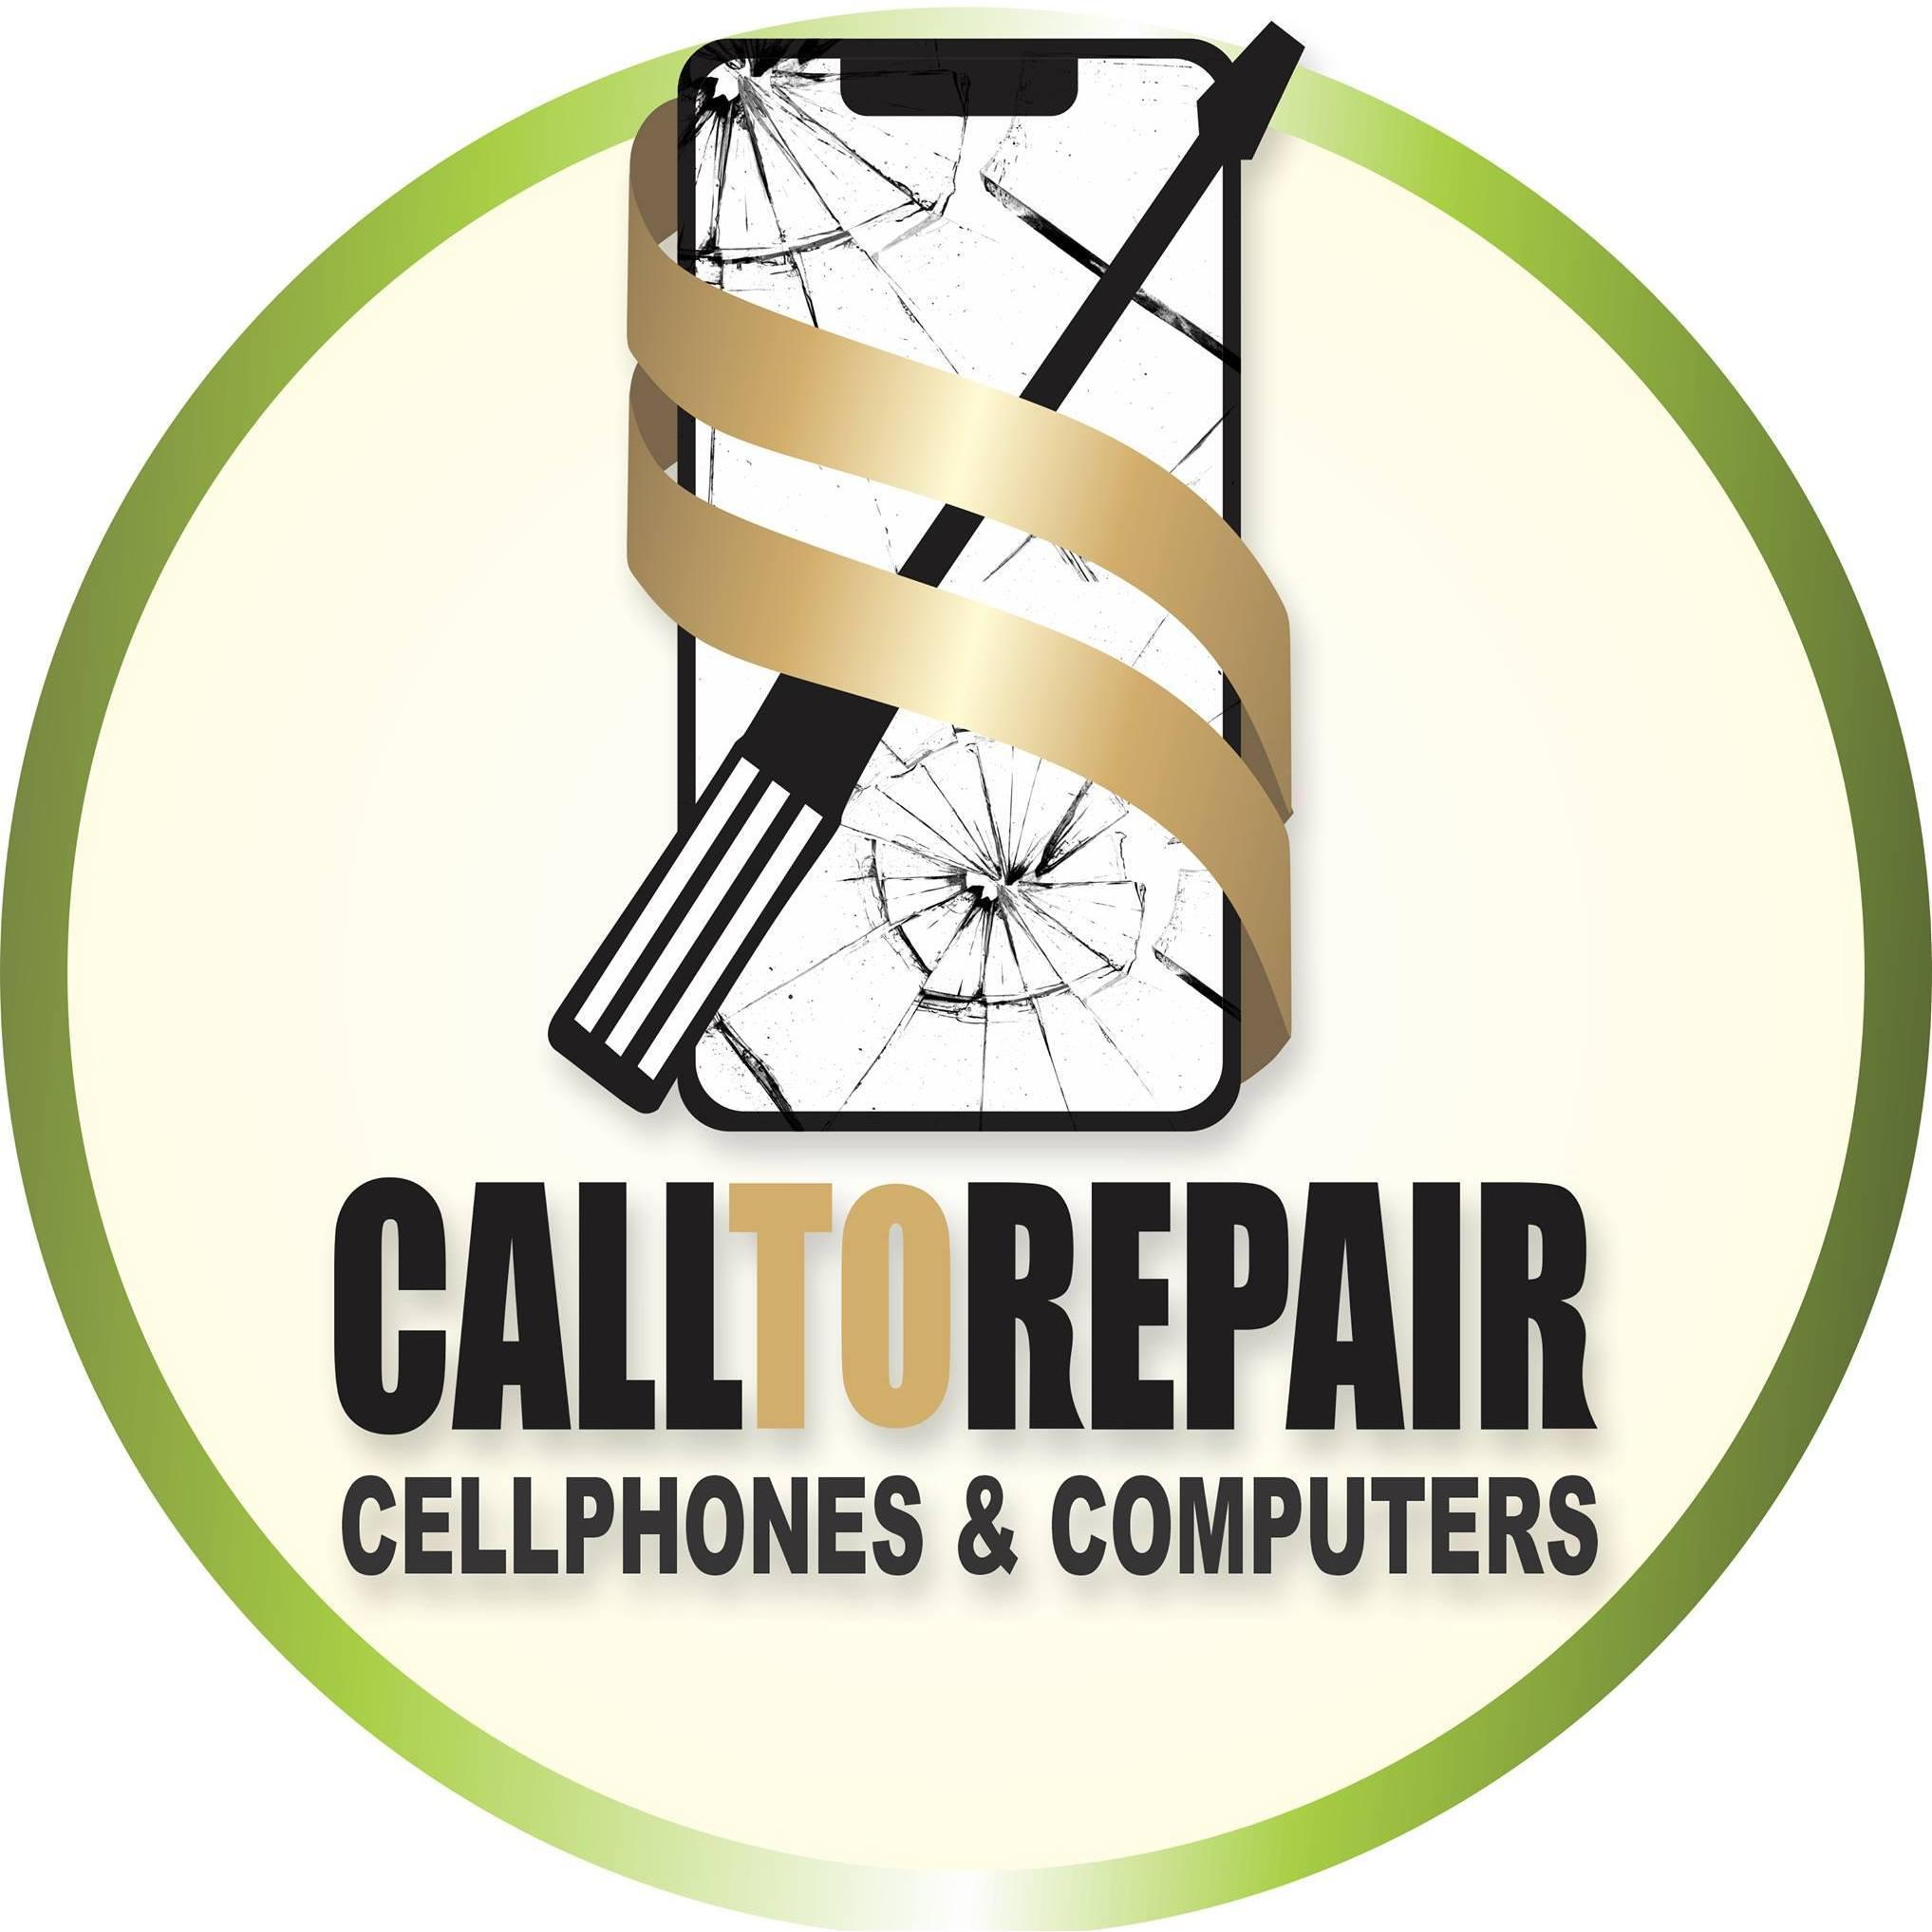 Calltorepair Cellphones & Computers